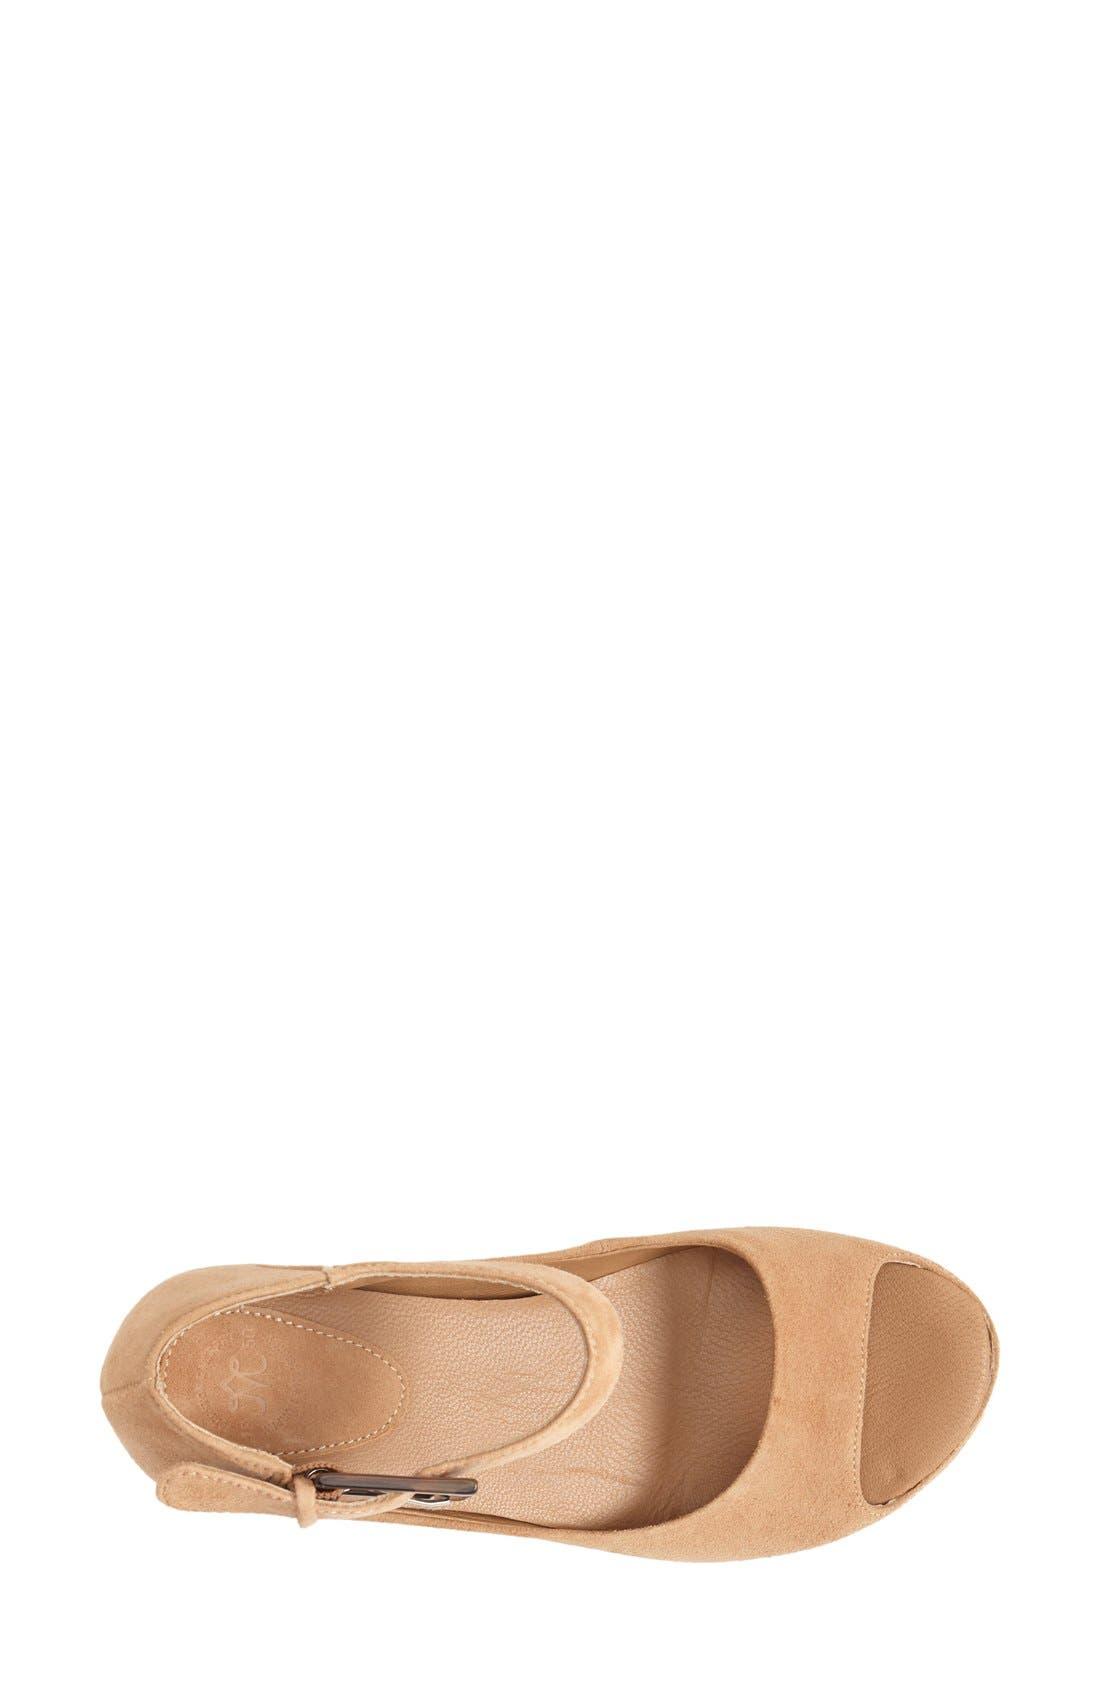 Alternate Image 3  - Johnston & Murphy 'Tricia' Ankle Strap Sandal